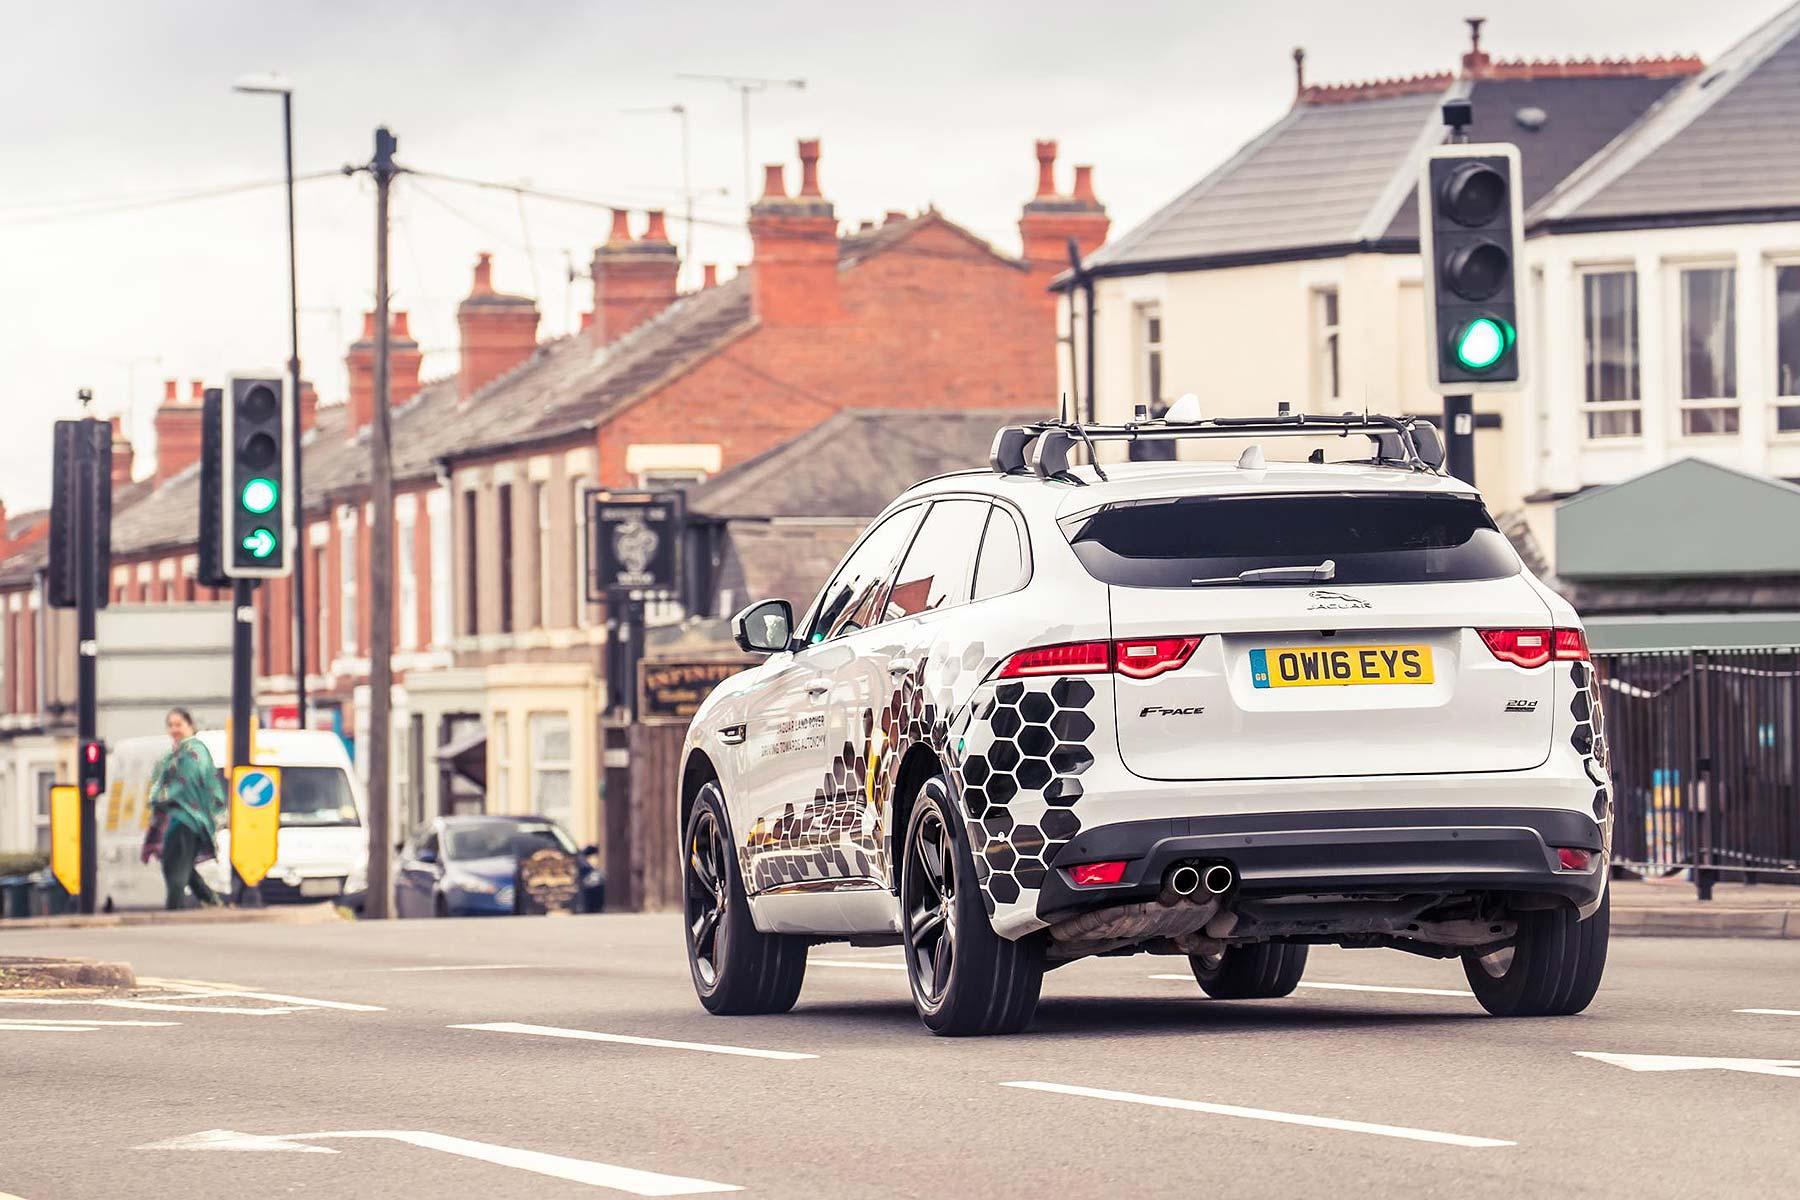 Jaguar Land Rover Green Light Optimal Speed Advisory tech